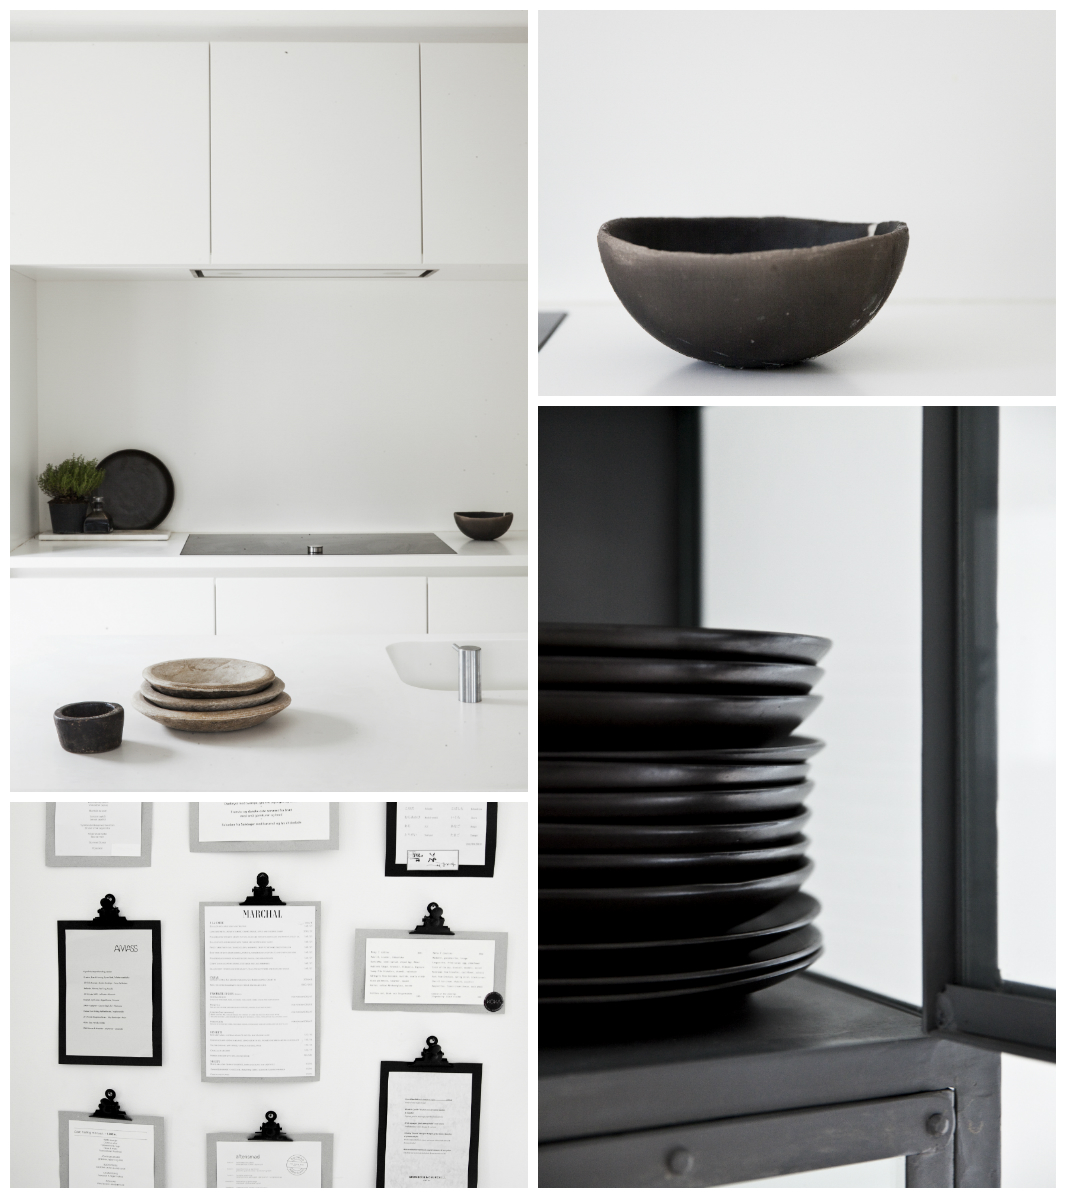 Norm-Architects-Kitchen-1